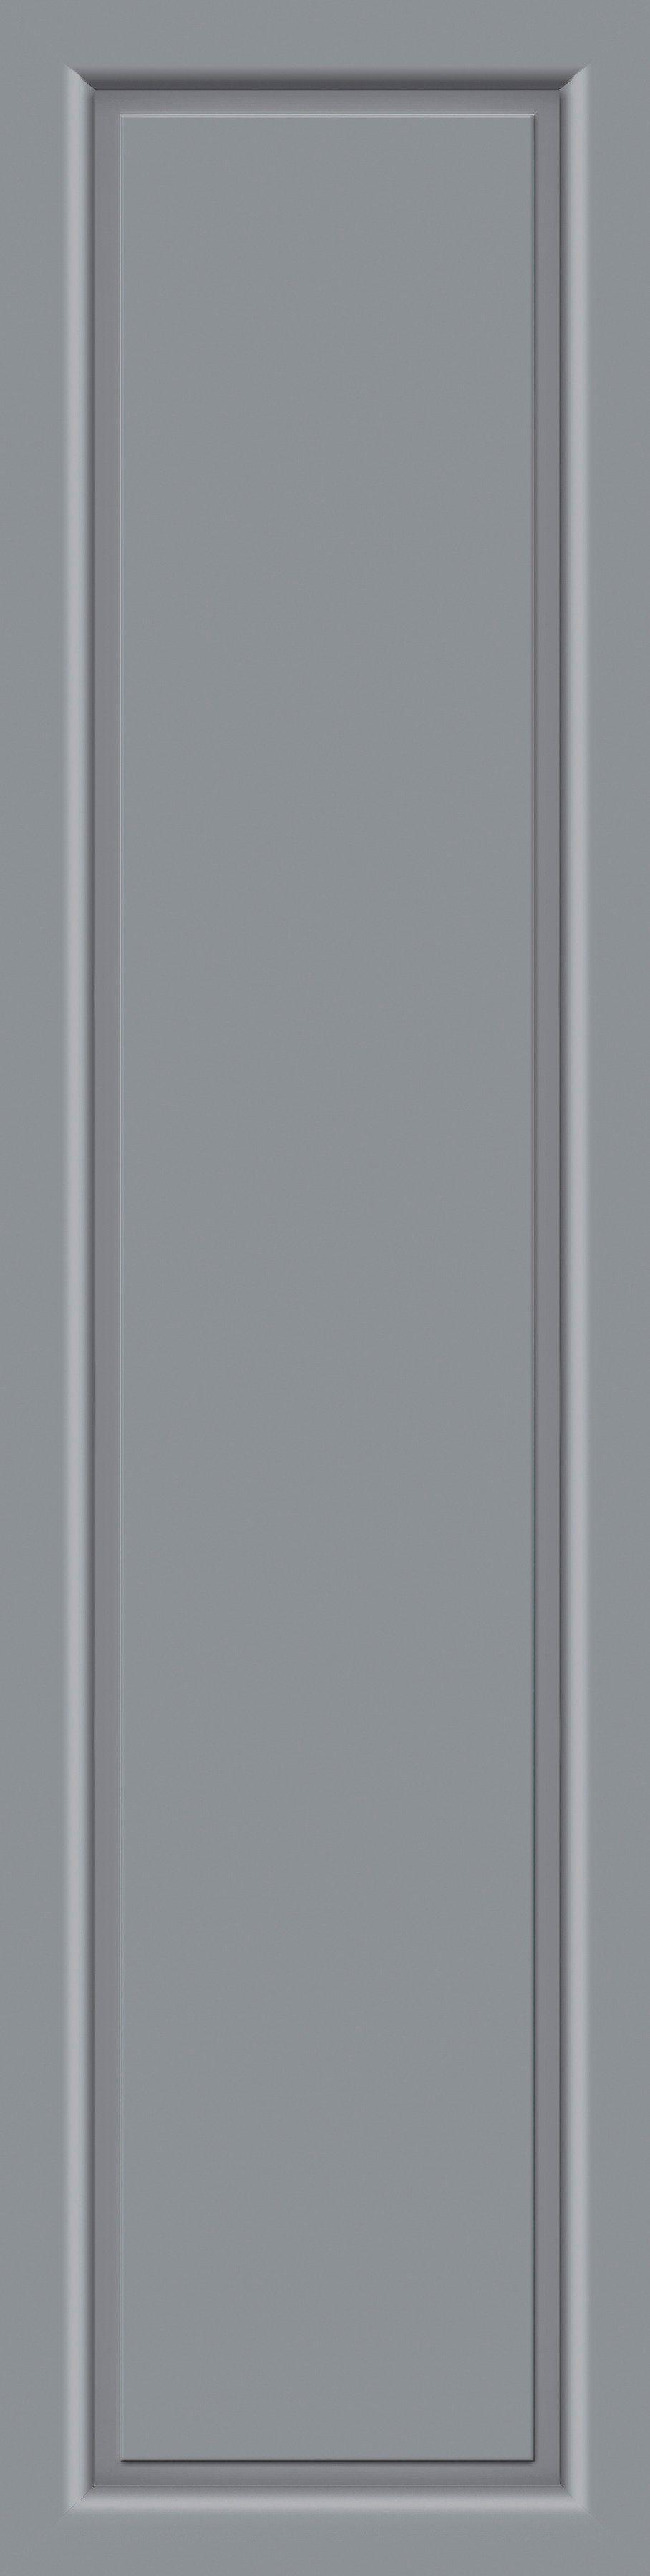 KM MEETH ZAUN GMBH Seitenteile »S04«, für Alu-Haustür, BxH: 60x208 cm, grau